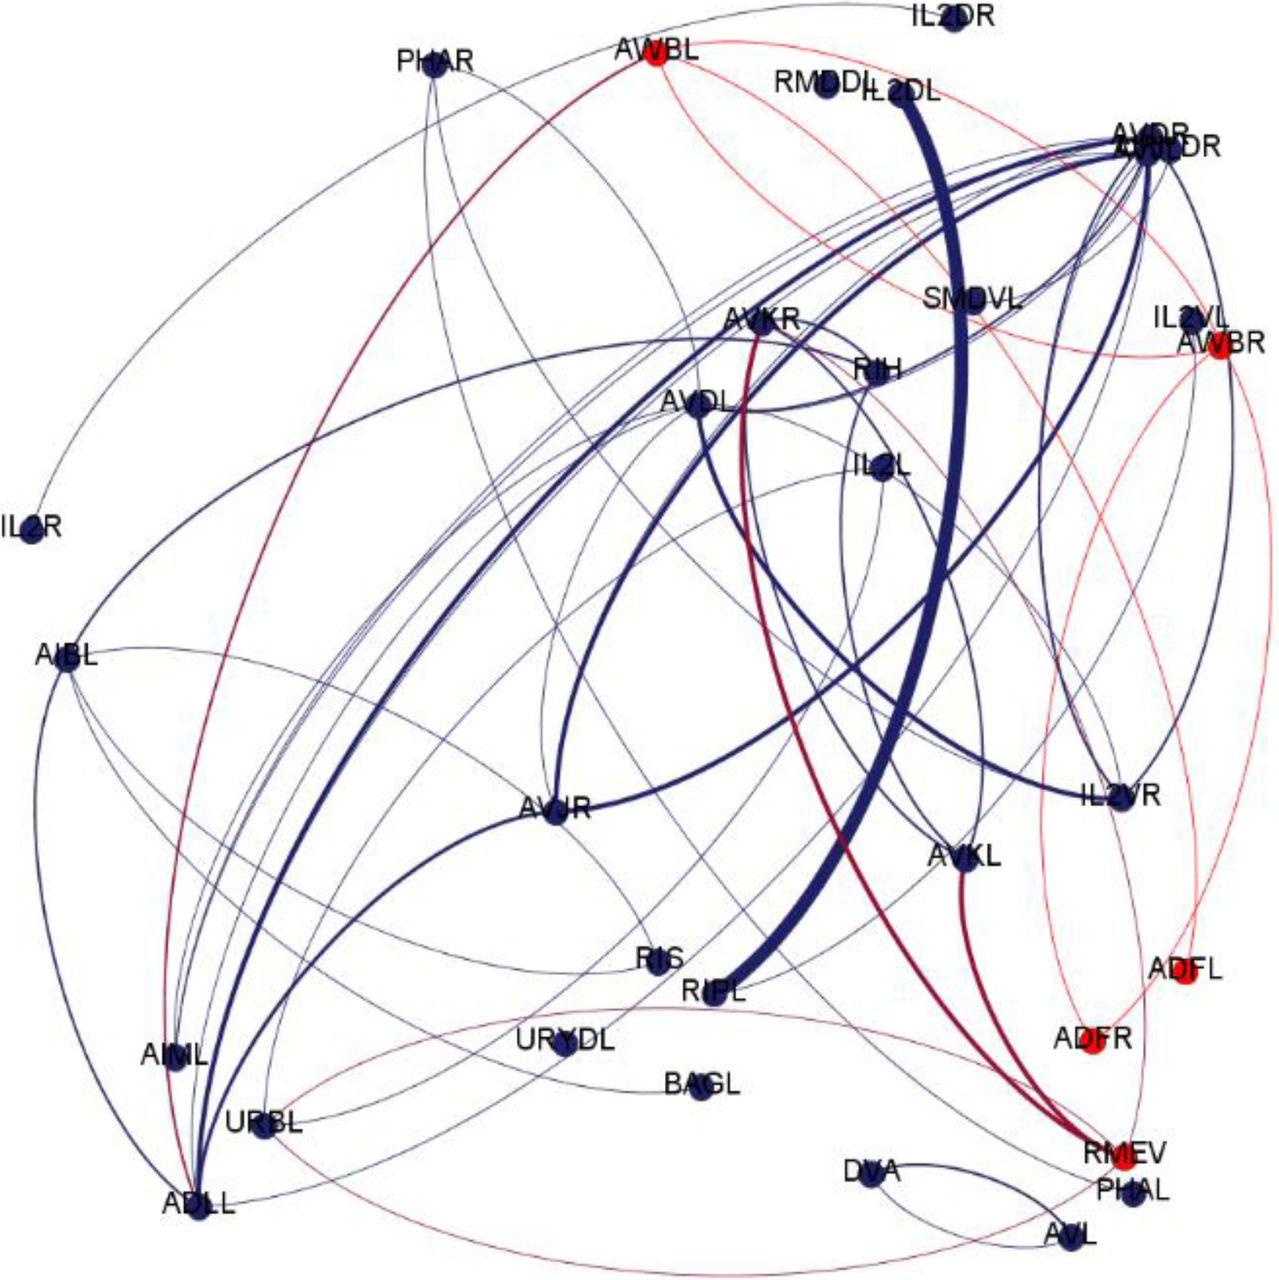 Wiring Diagram Adjacency Matrix C Elegans